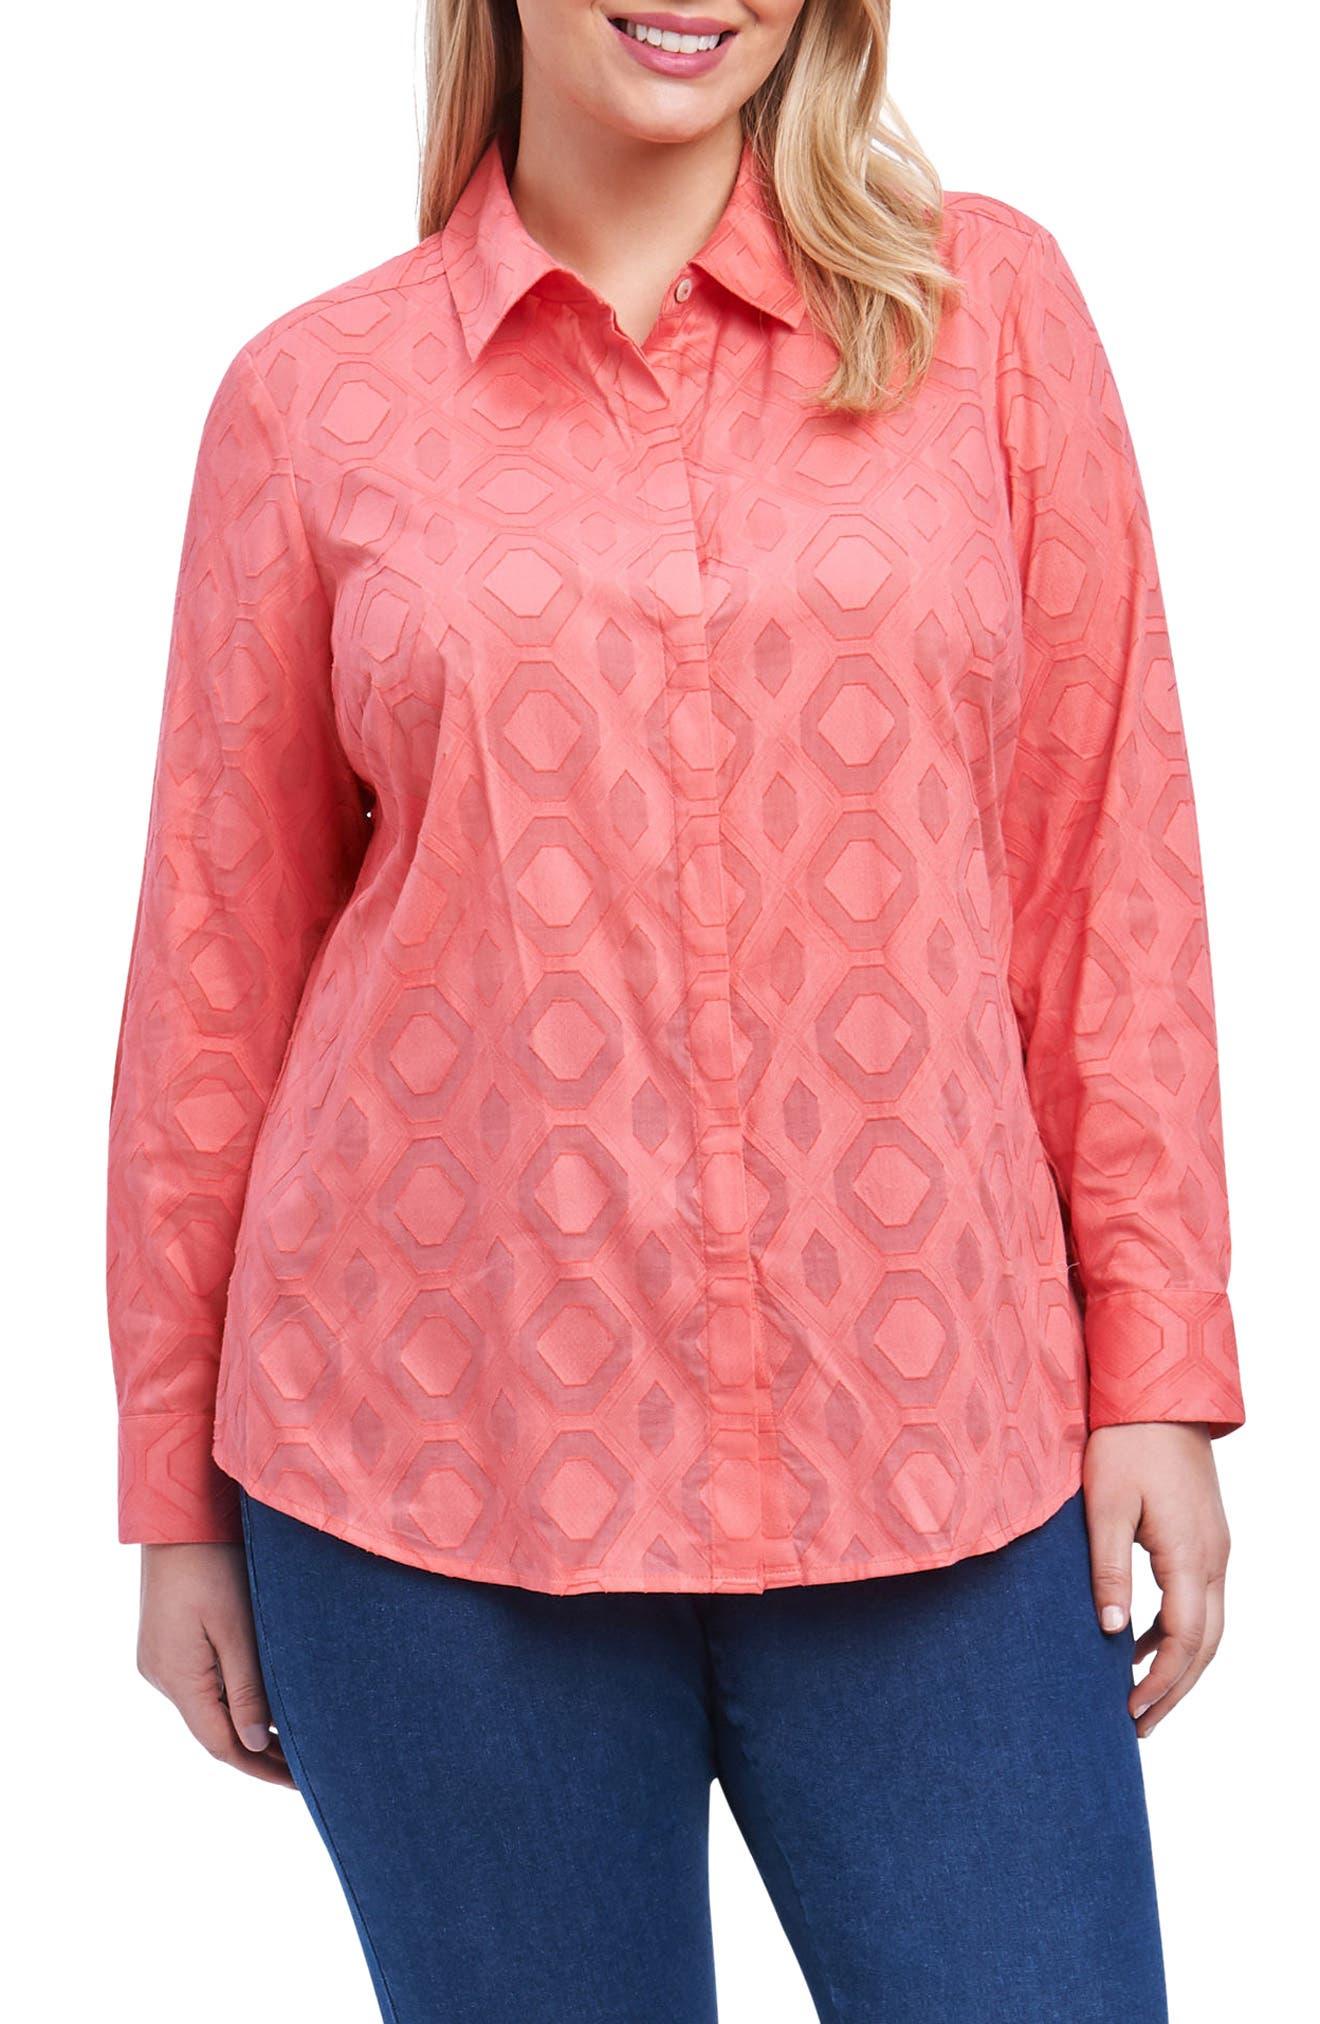 Ava Diamond Clip Jacquard Shirt,                         Main,                         color, Sunset Coral